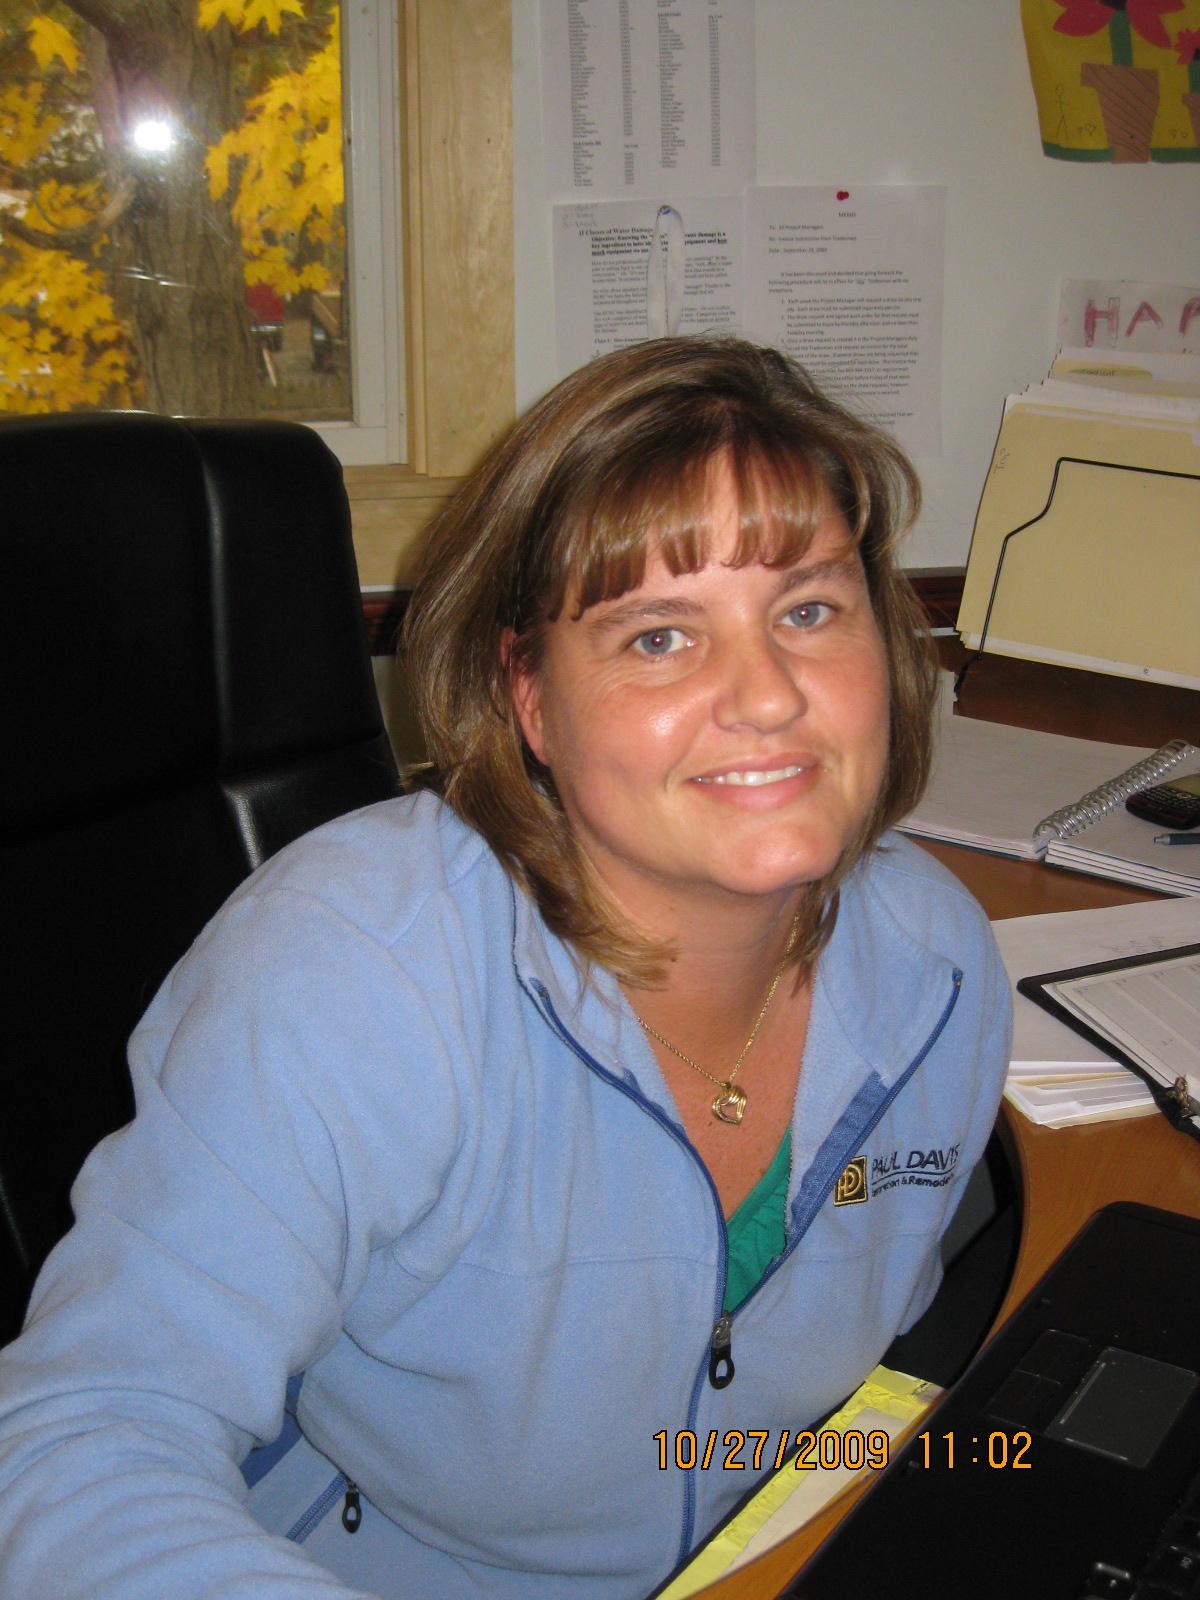 Paul Davis Emergency And Restoration Services North Hampton Nh